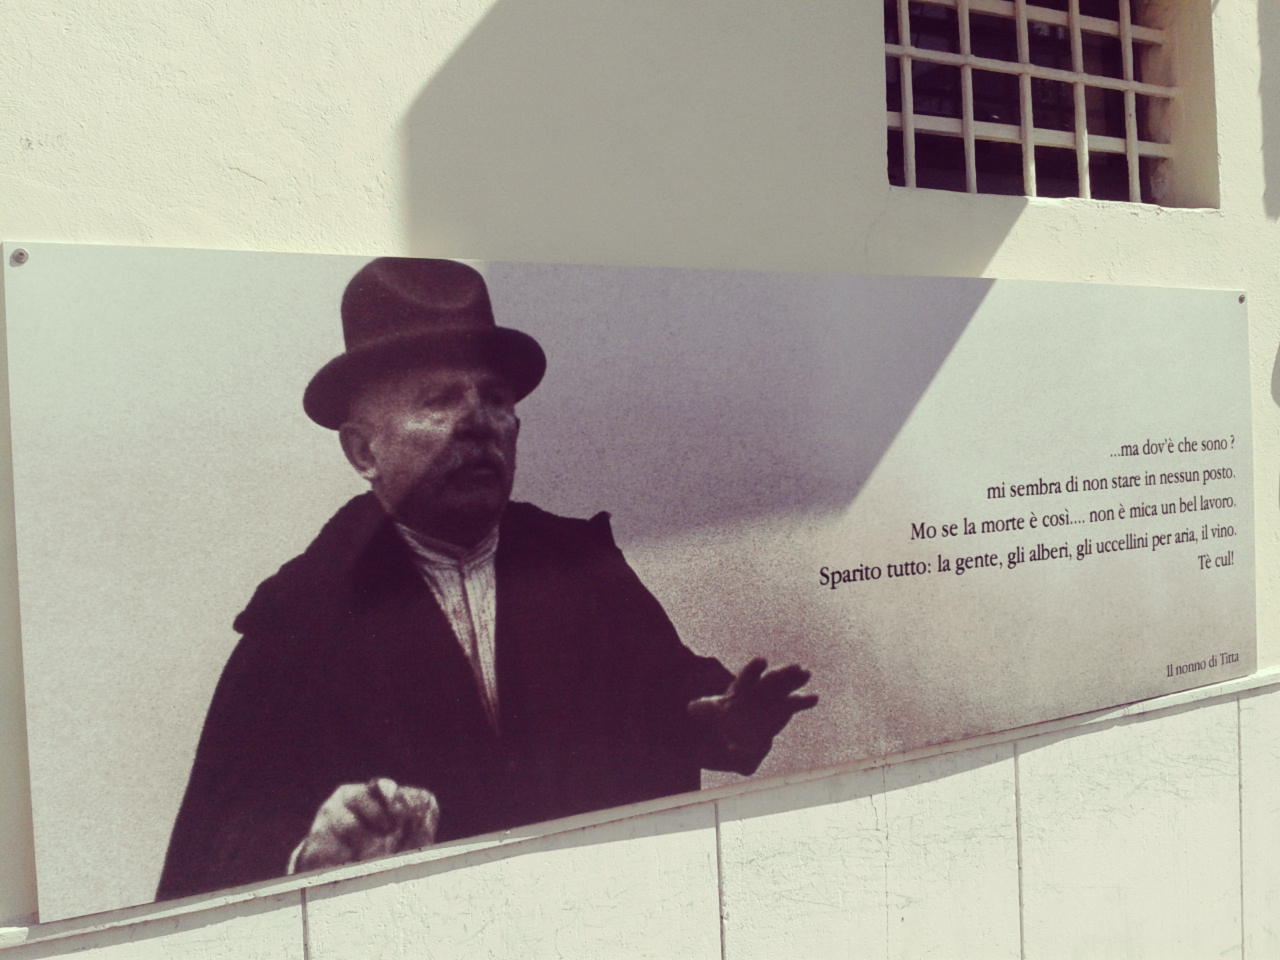 Fellini quotes on the walls near Rimini's Market